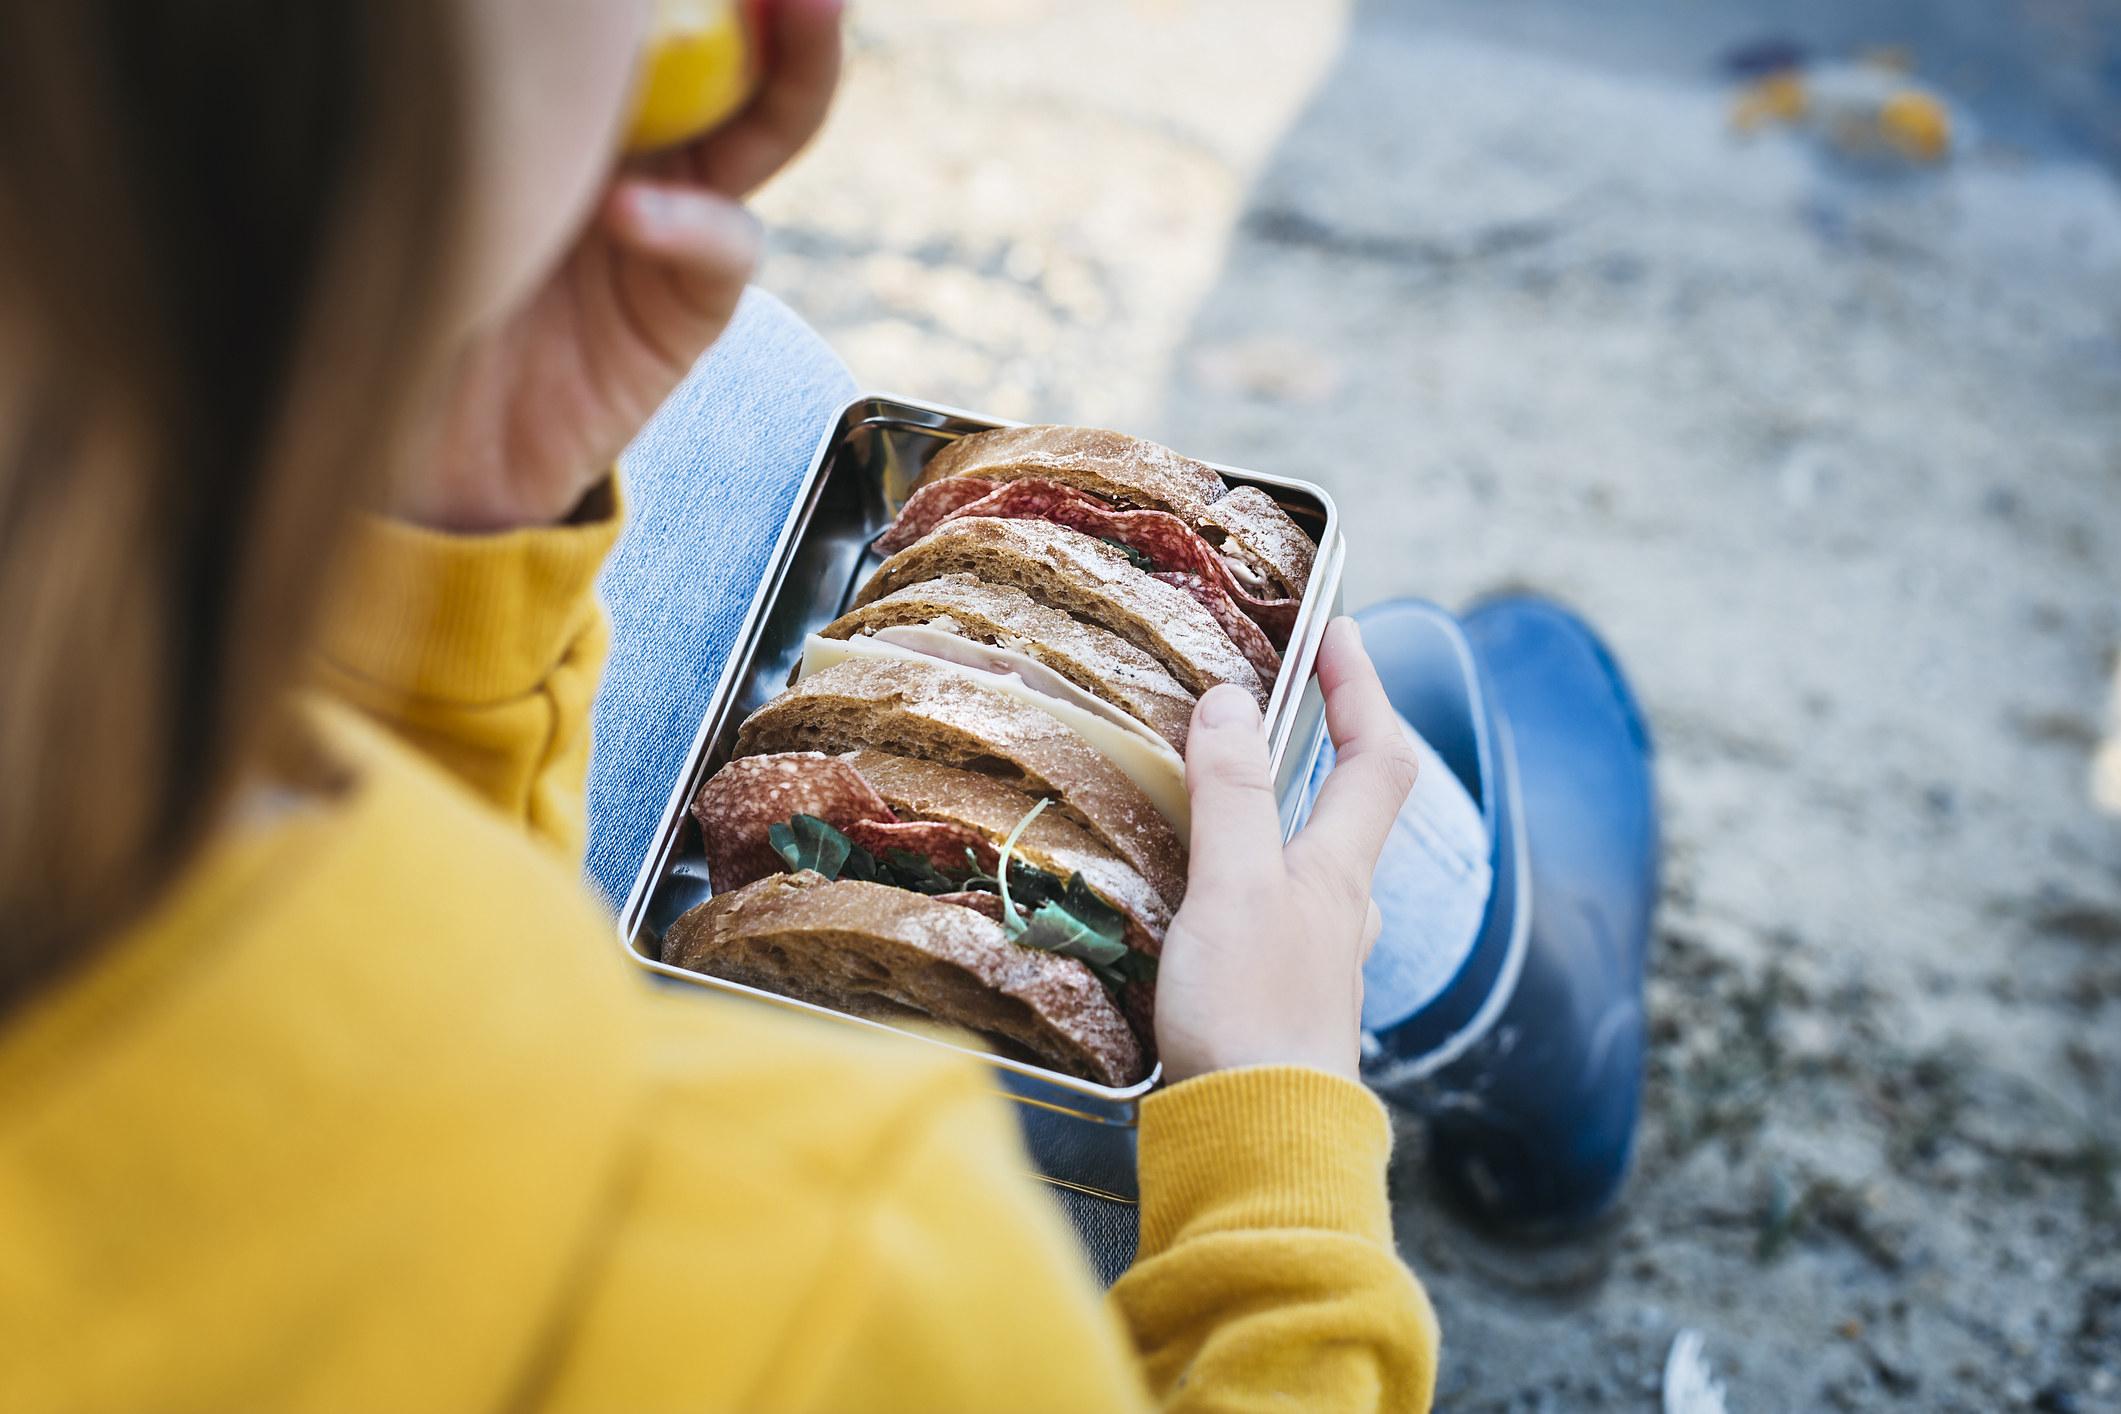 A woman eating a sandwich outside.